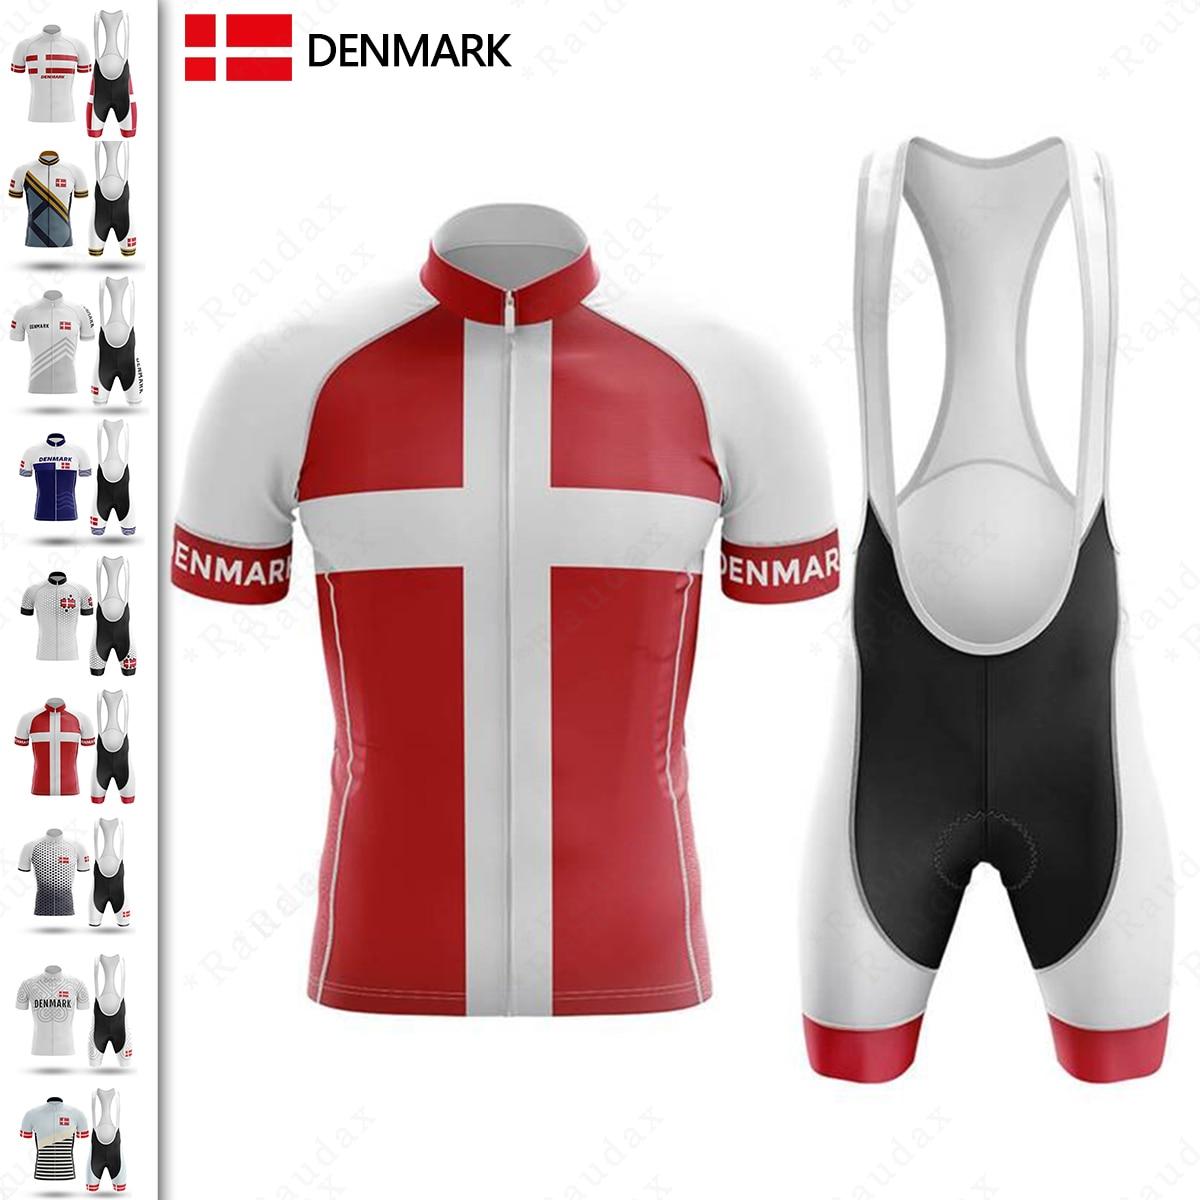 Camiseta De Ciclismo para hombre, ropa deportiva profesional De descenso, con bandera...